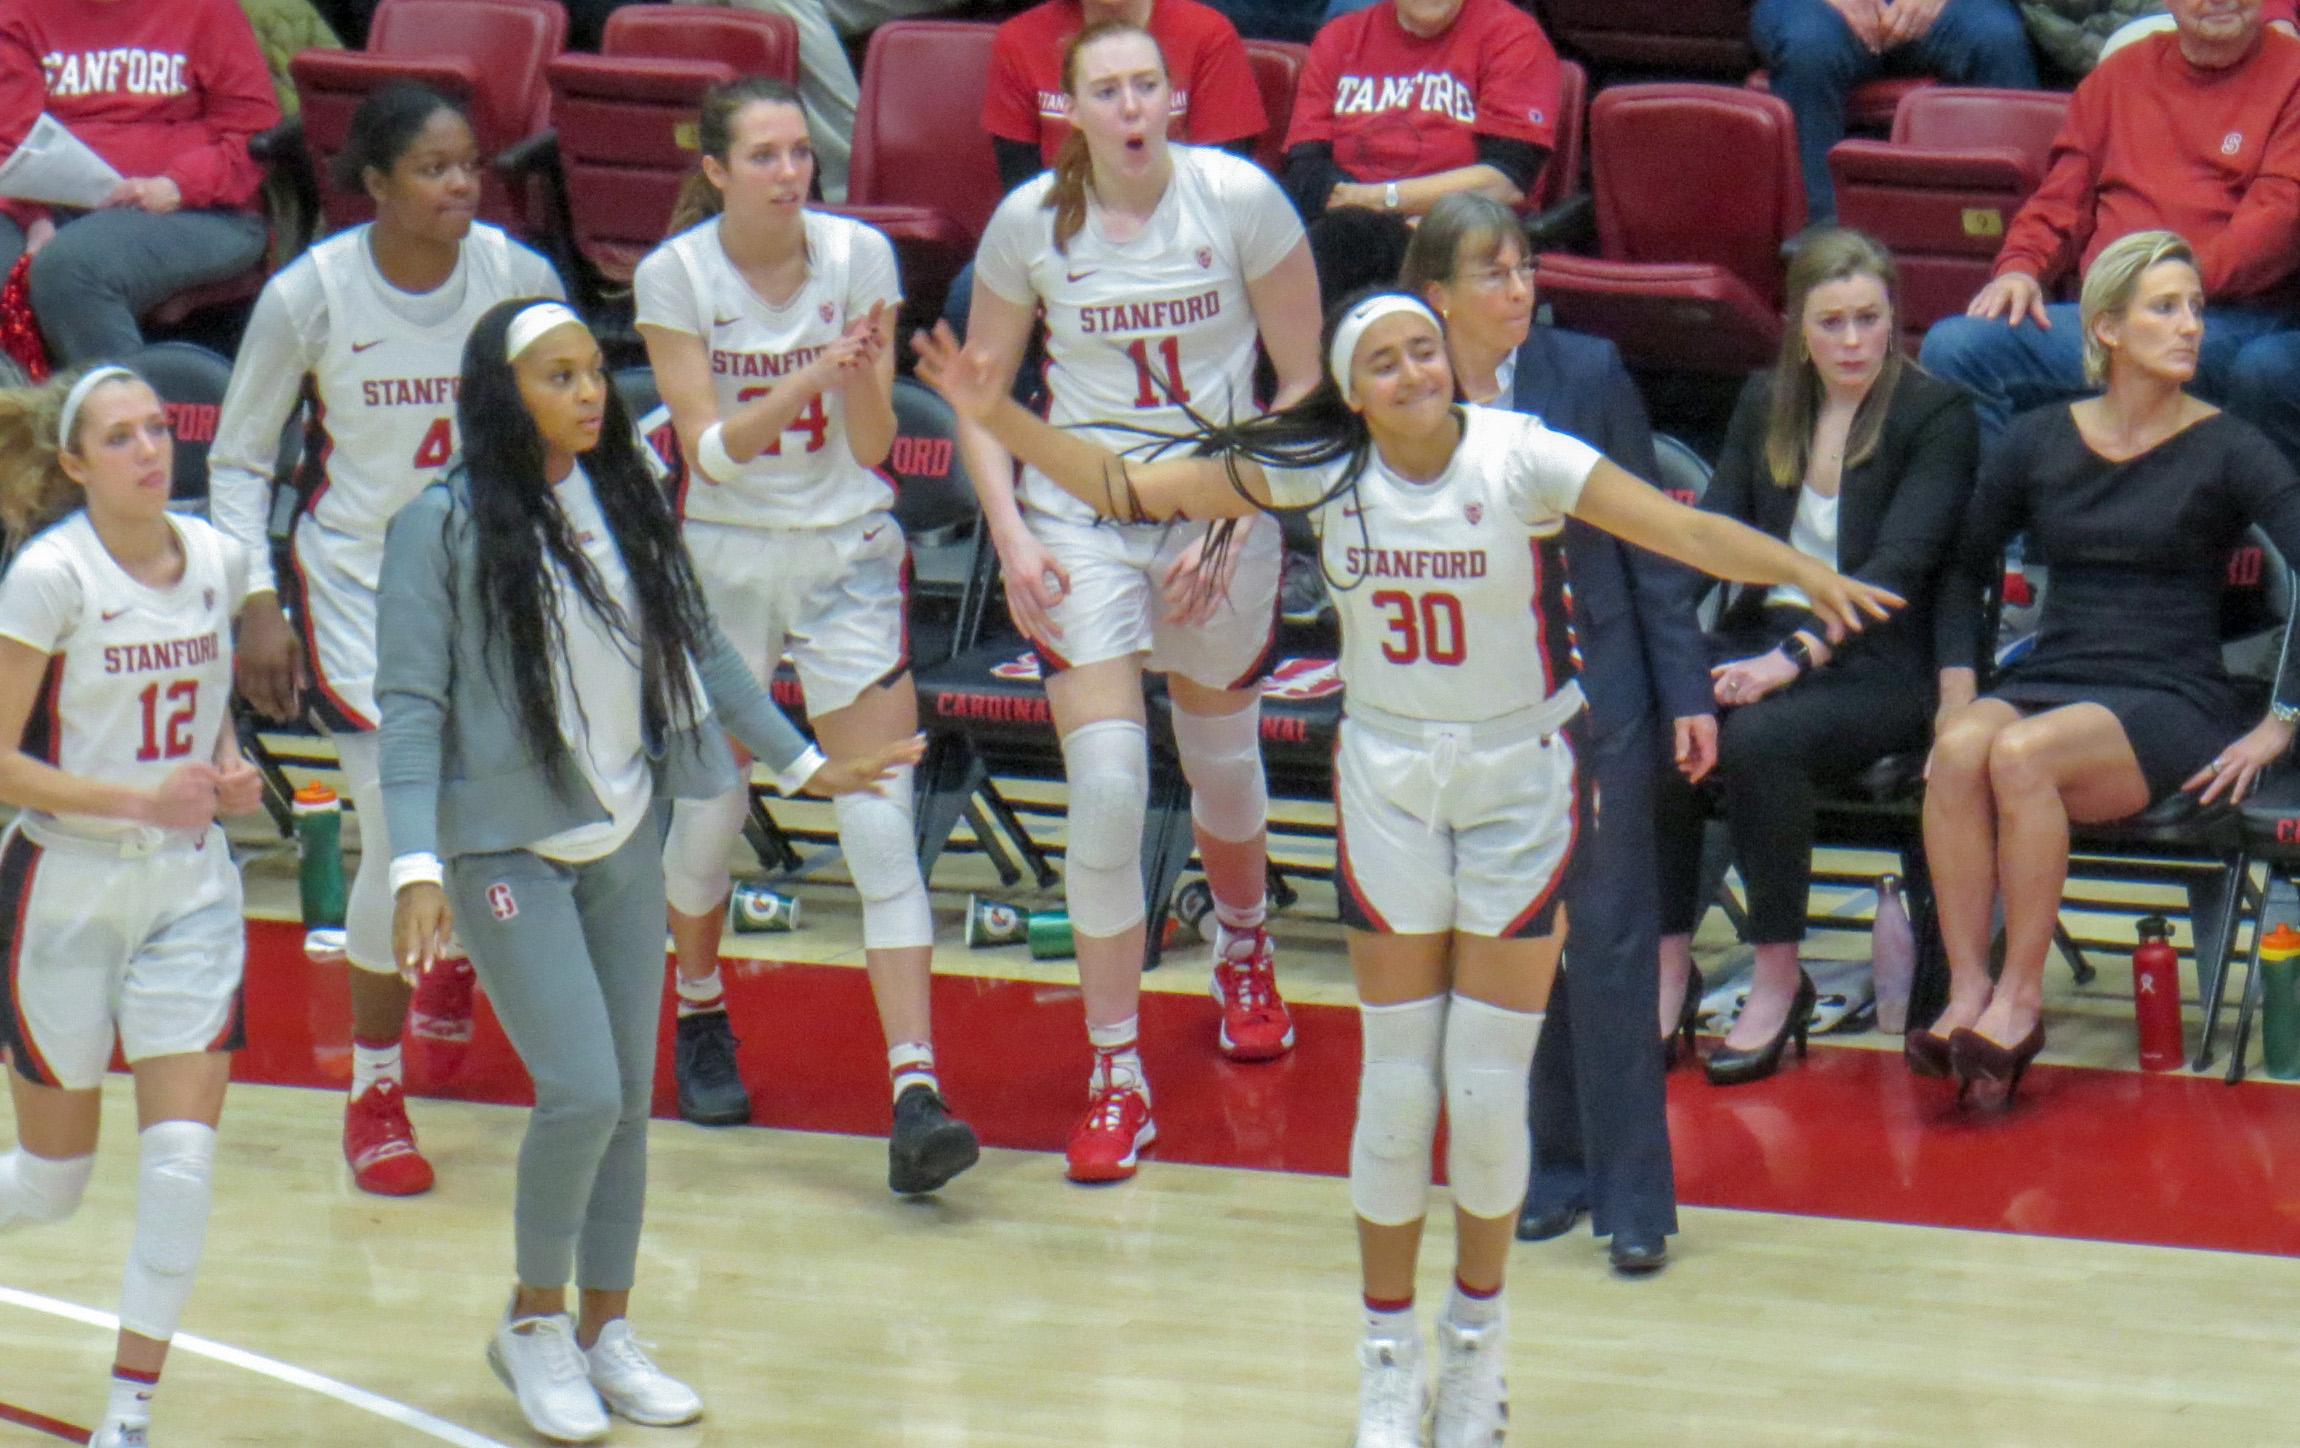 Tara VanDerveer hits milestone as Stanford dominates Cal 73-40 in rivalry series game